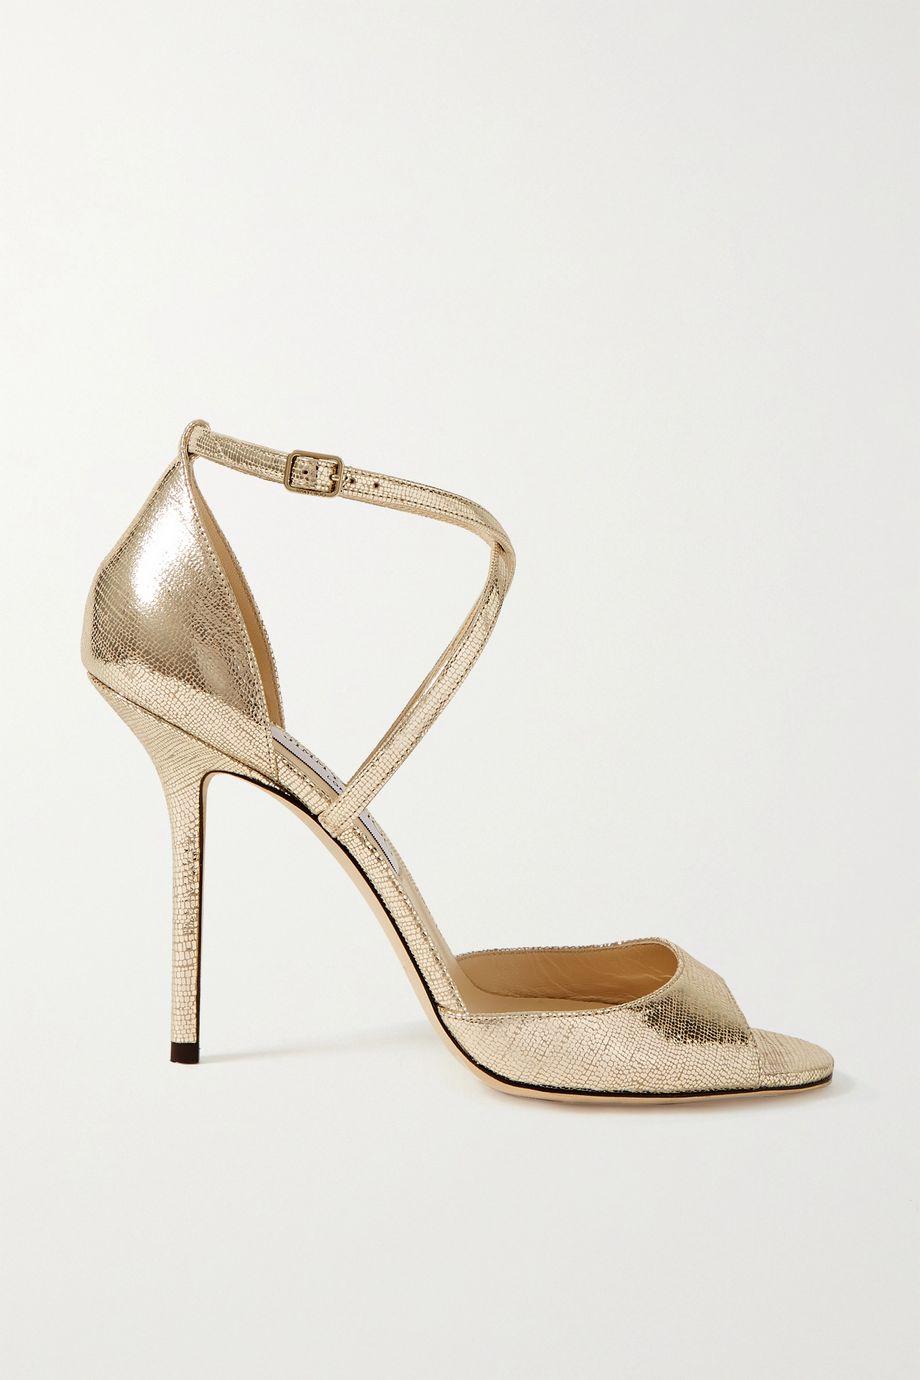 Jimmy Choo Emsy 100 metallic lizard-effect leather sandals